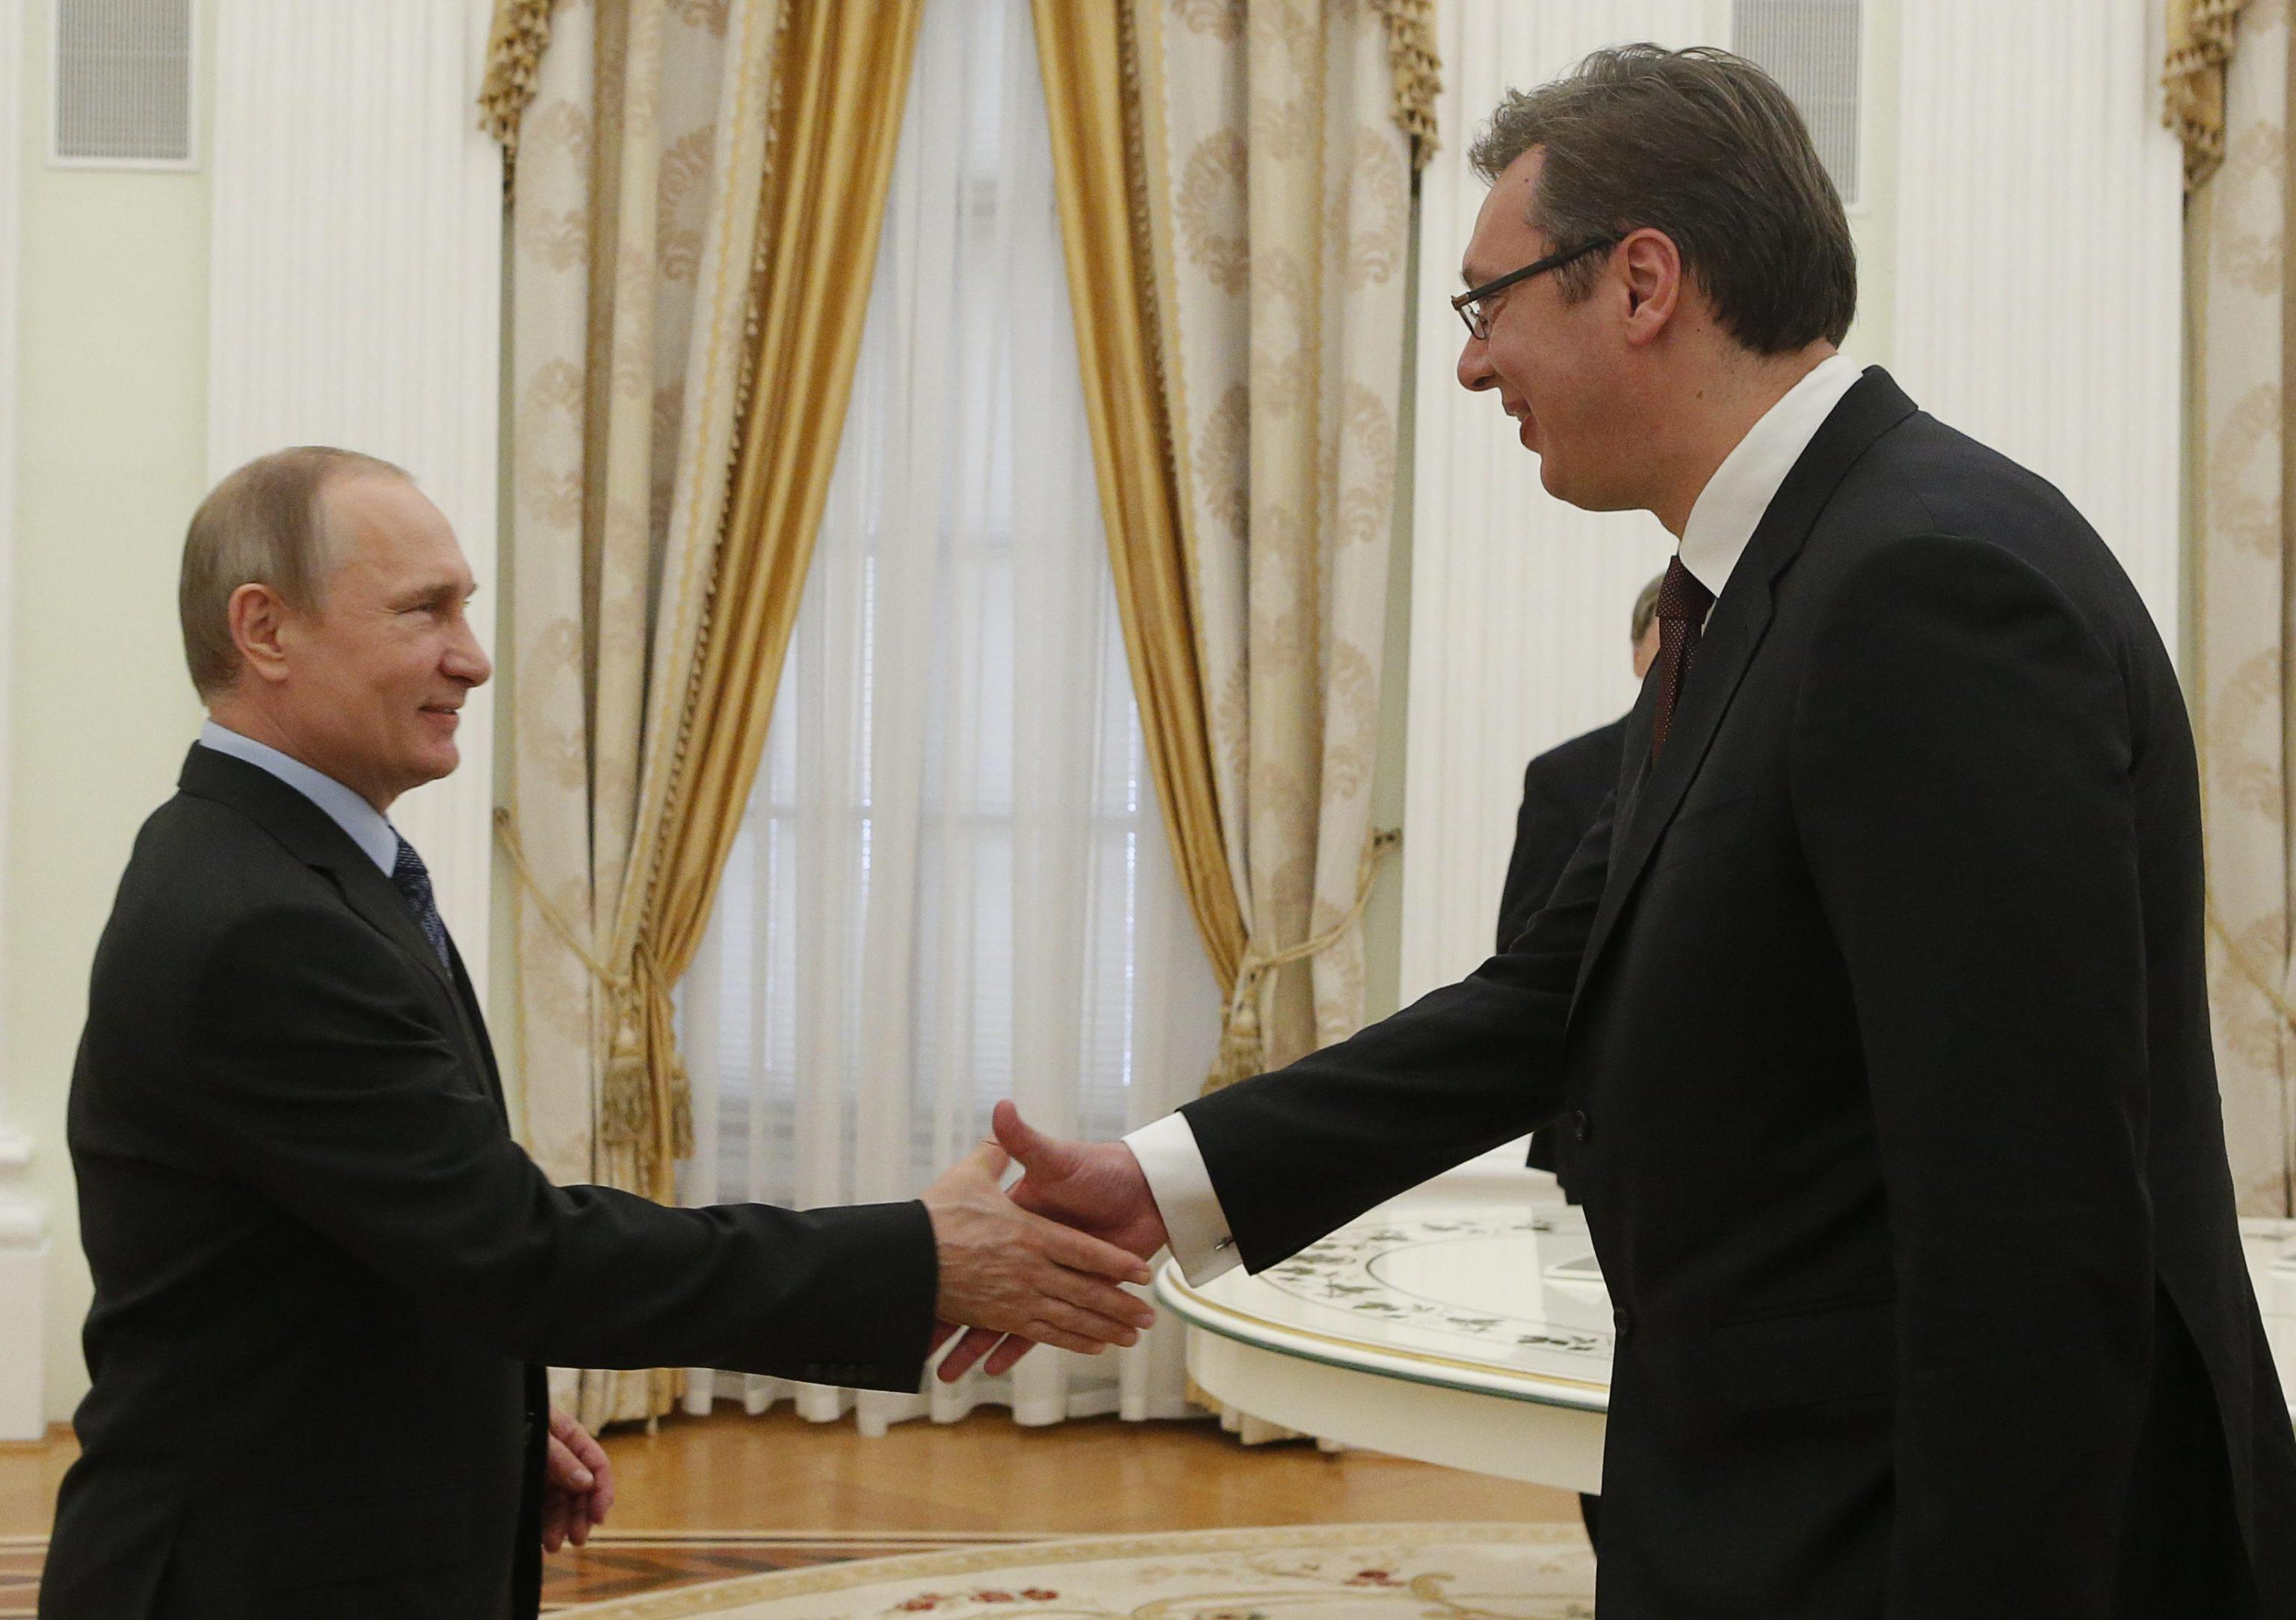 Serbia: Vucic a Mosca per intese energia